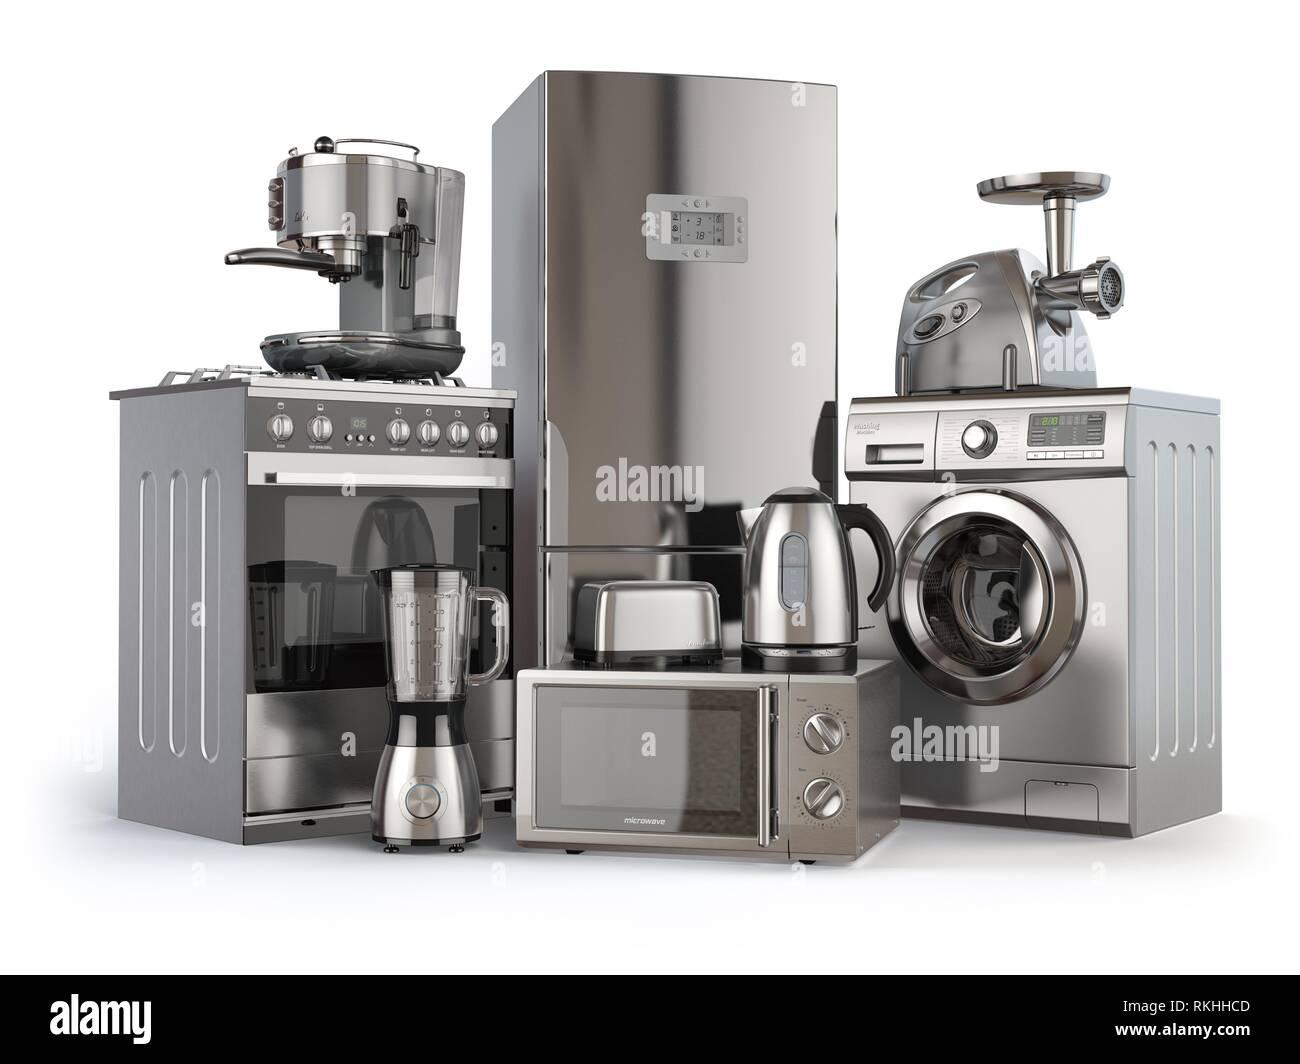 Home appliances. Fornello a gas, frigorifero, forno a